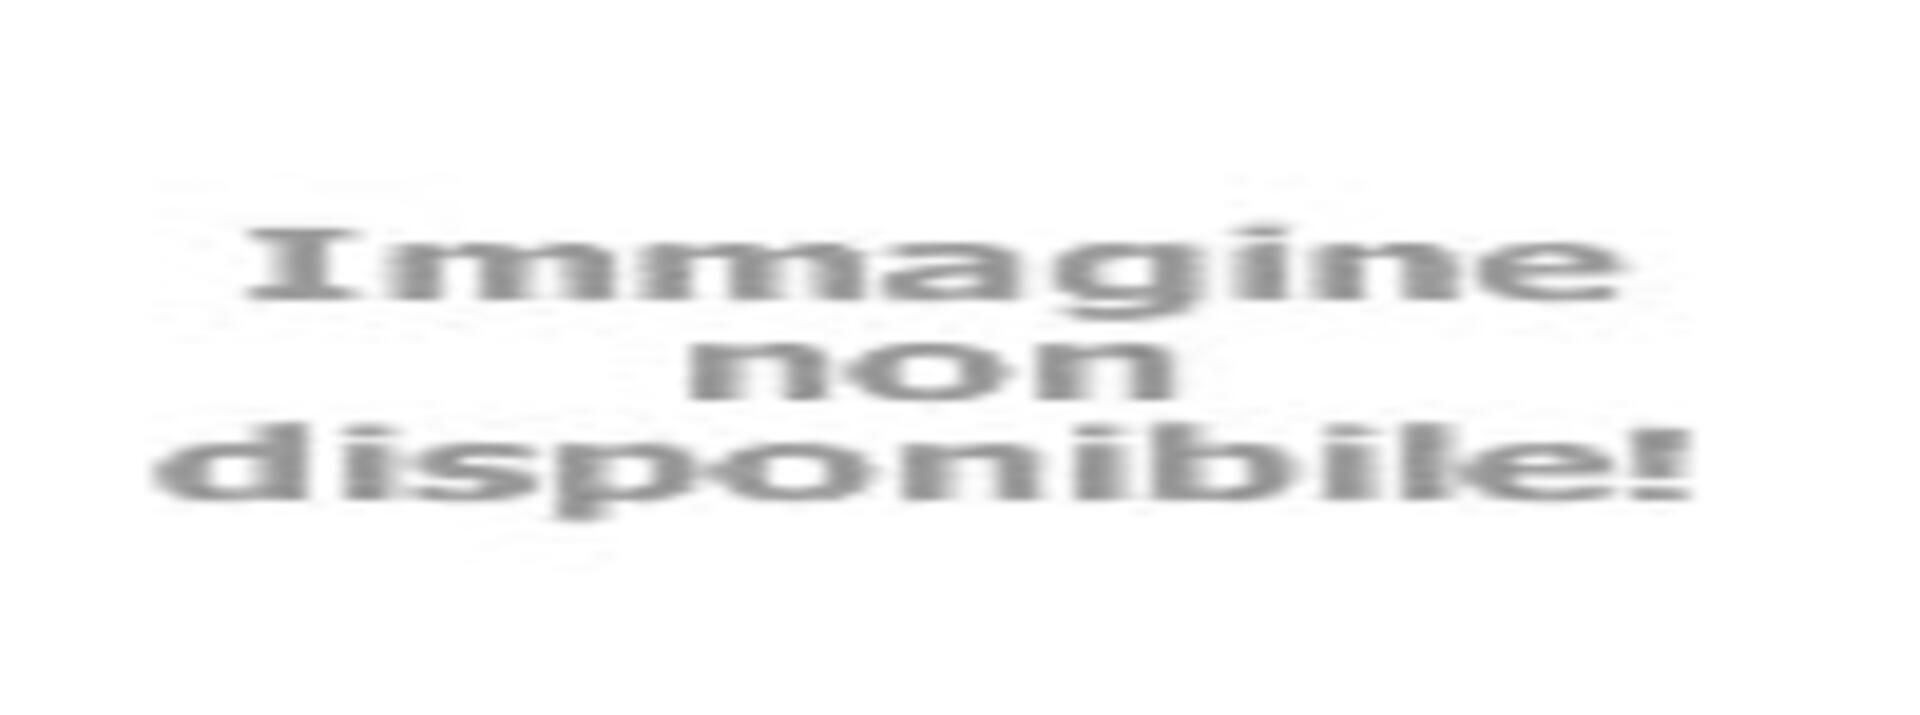 sangregorioresidencehotel it colazione 004